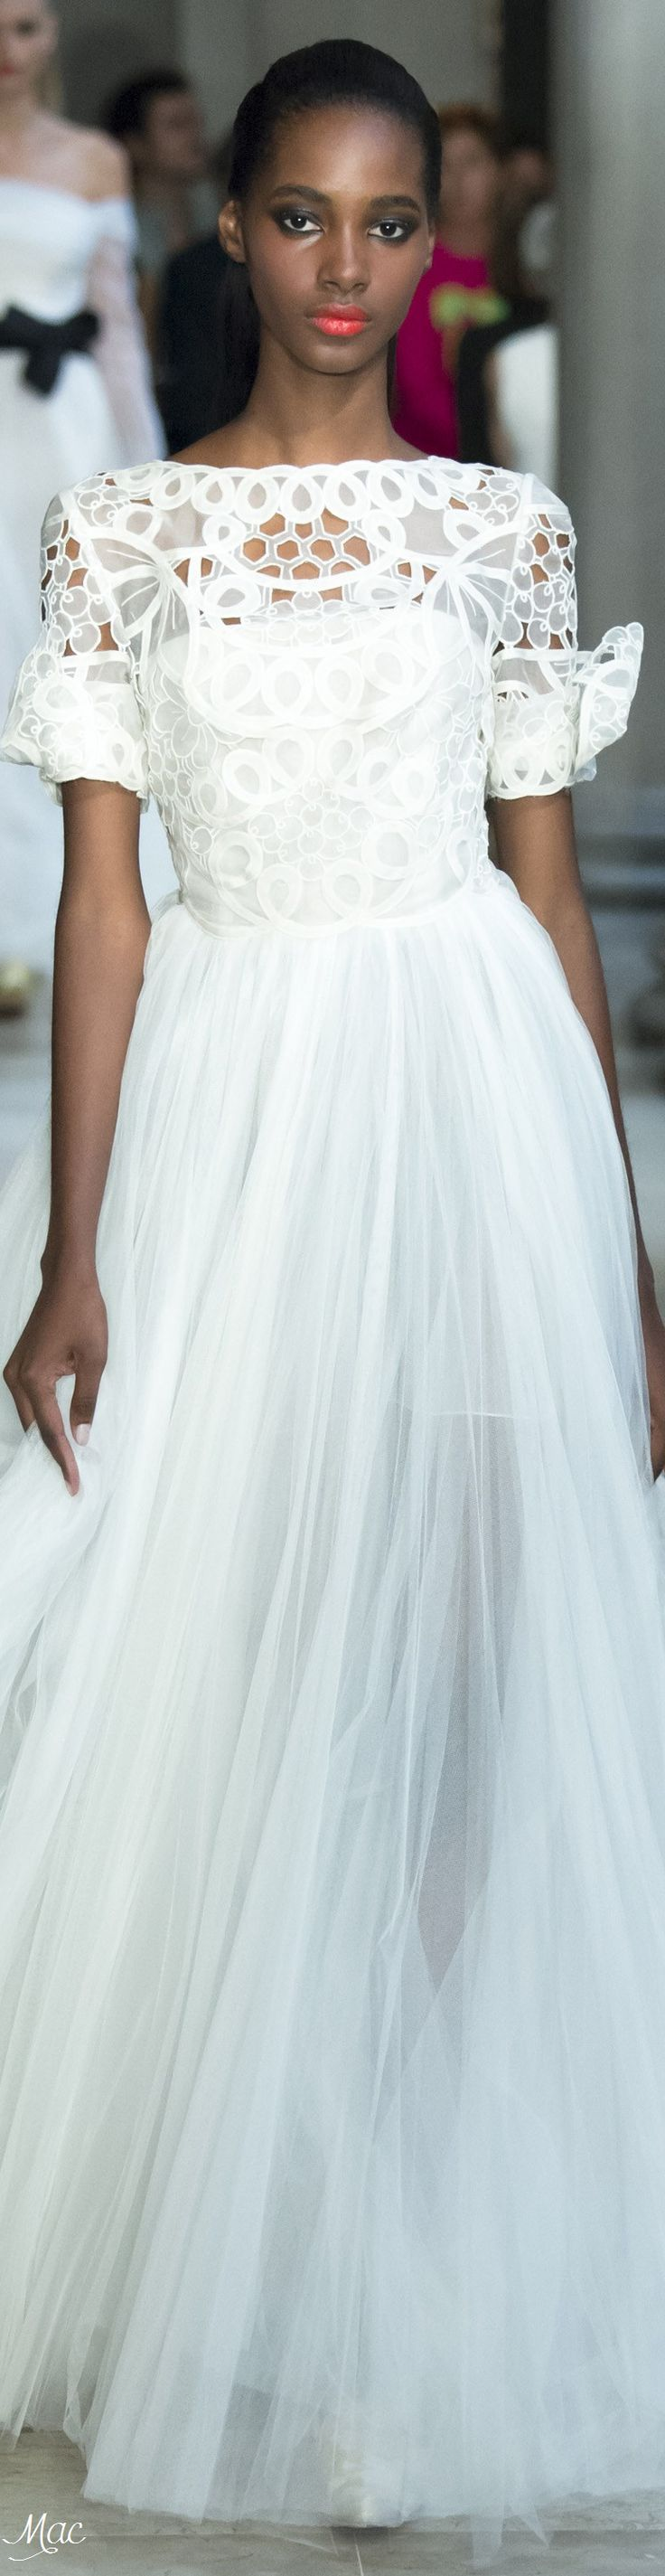 1250 best CATWALK images on Pinterest   Fashion show, High fashion ...